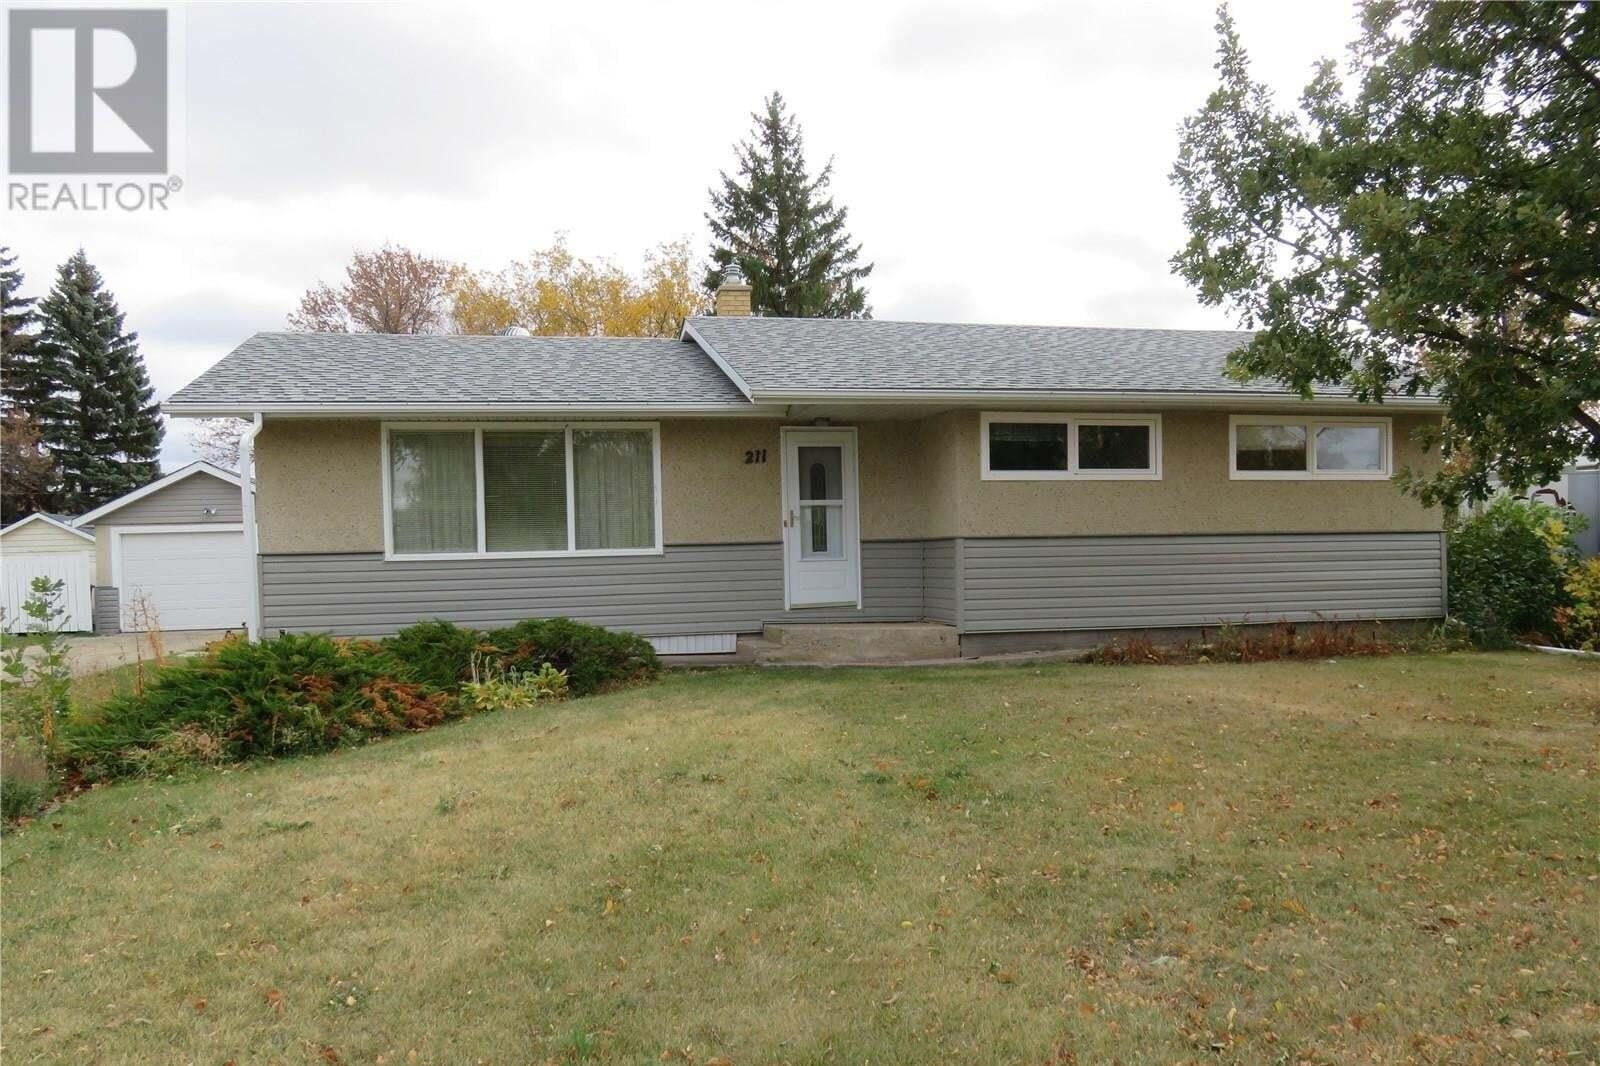 House for sale at 211 Pierce St Strasbourg Saskatchewan - MLS: SK830511